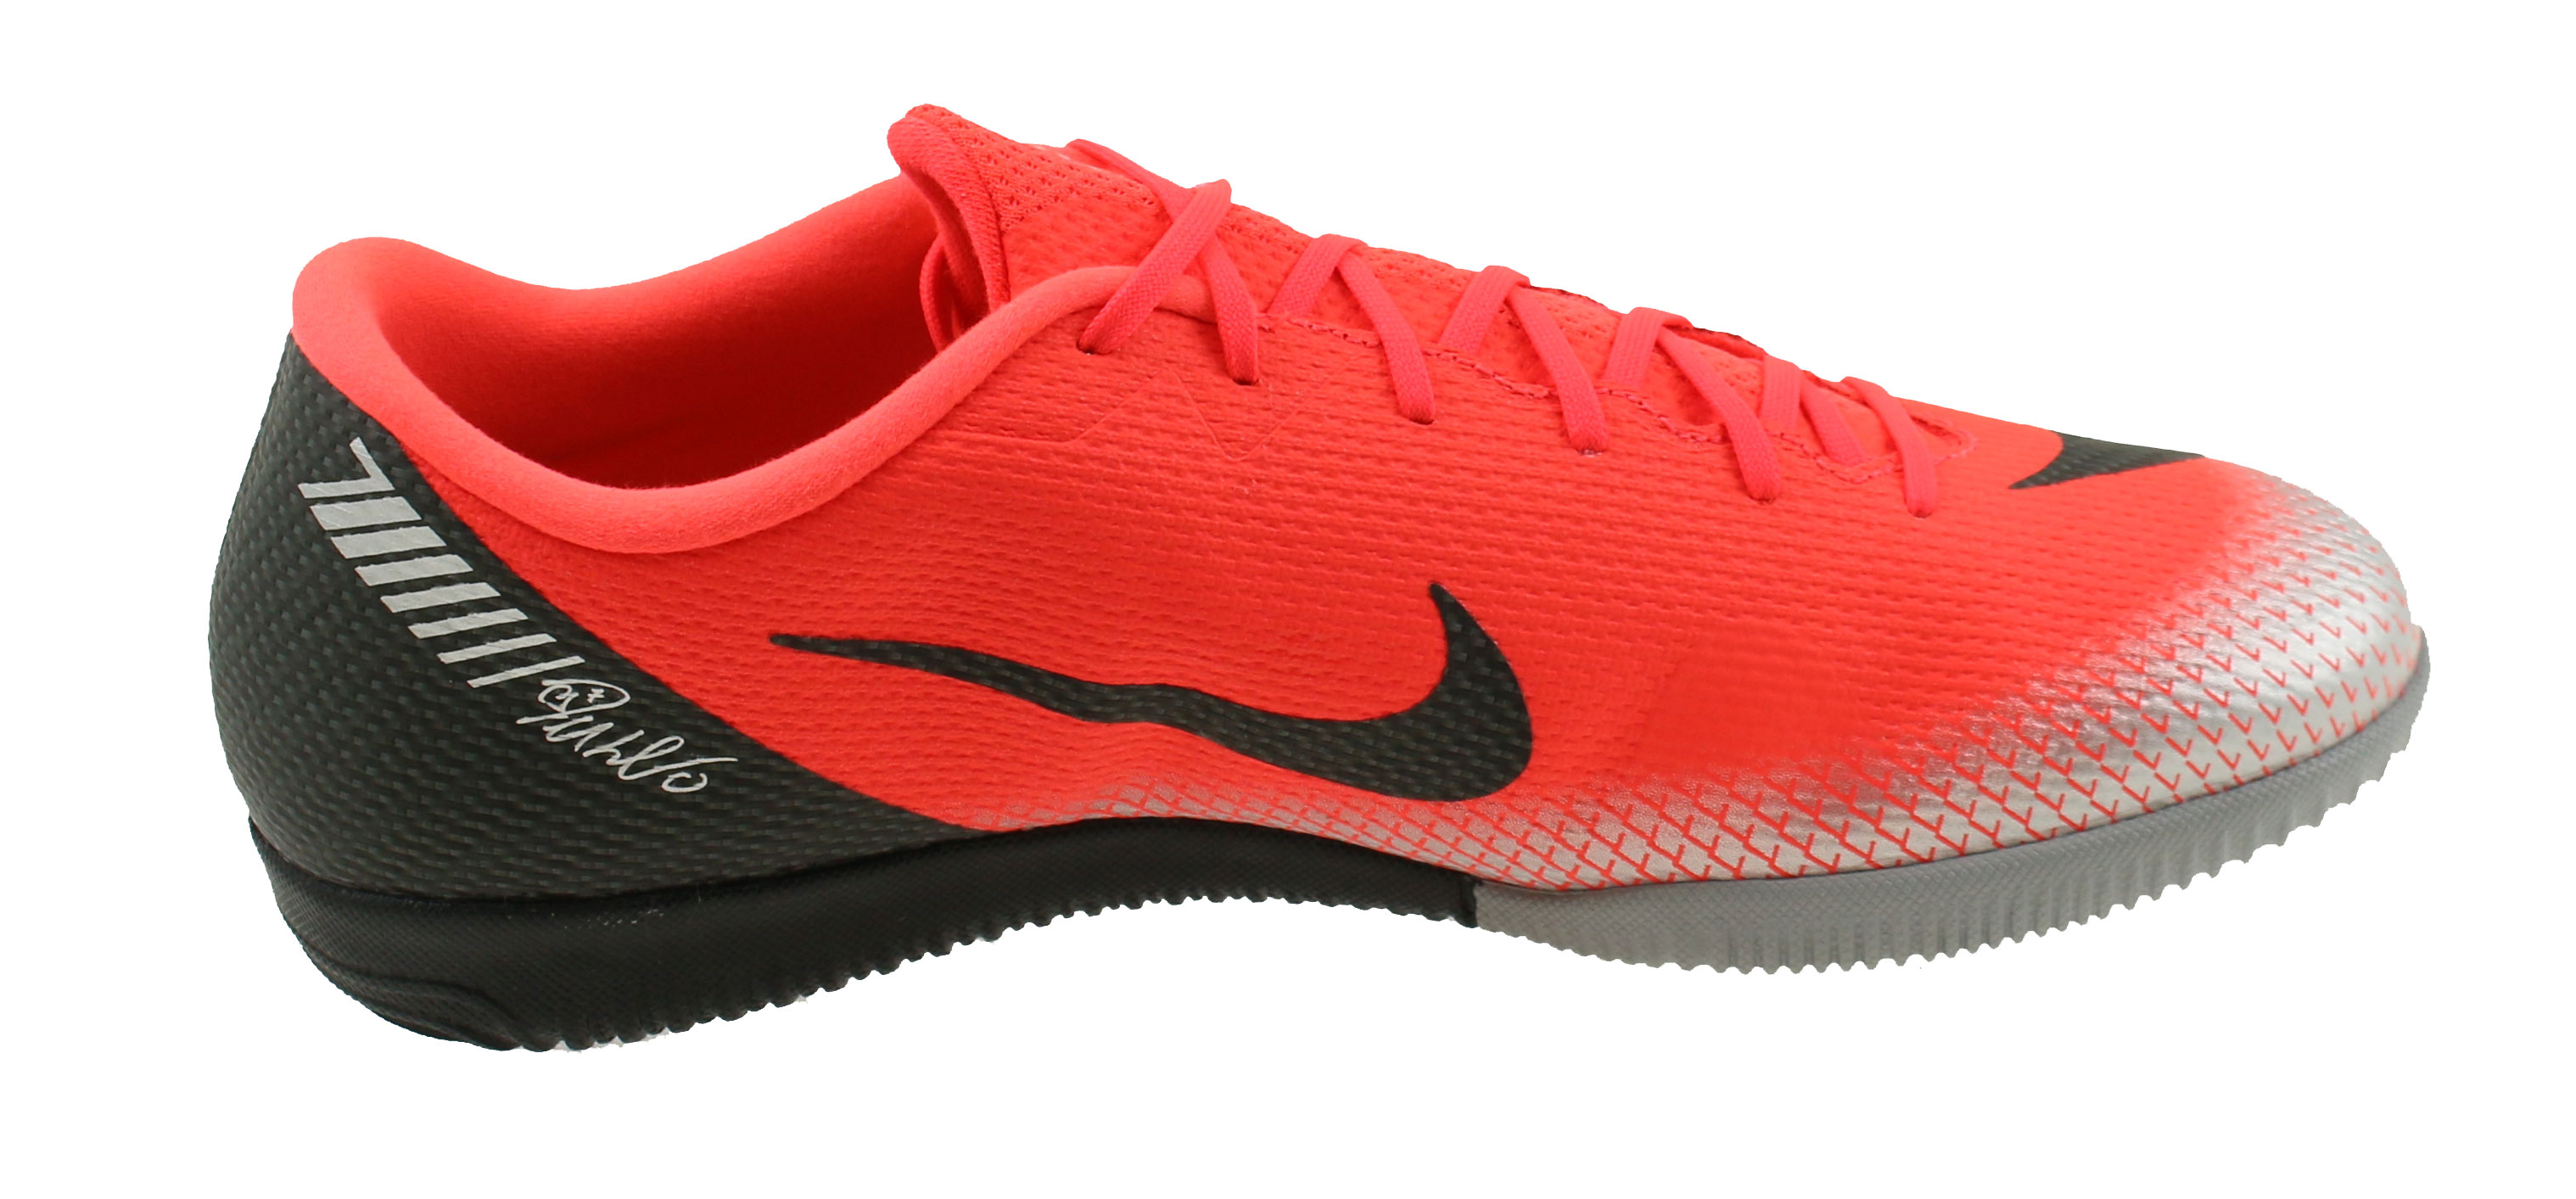 be20966d92d8 Nike Mercurial Vapor XII Academy CR7 Indoor. AJ3731 600 Bright Crimson Black  Chrome. Product afbeelding Product afbeelding ...